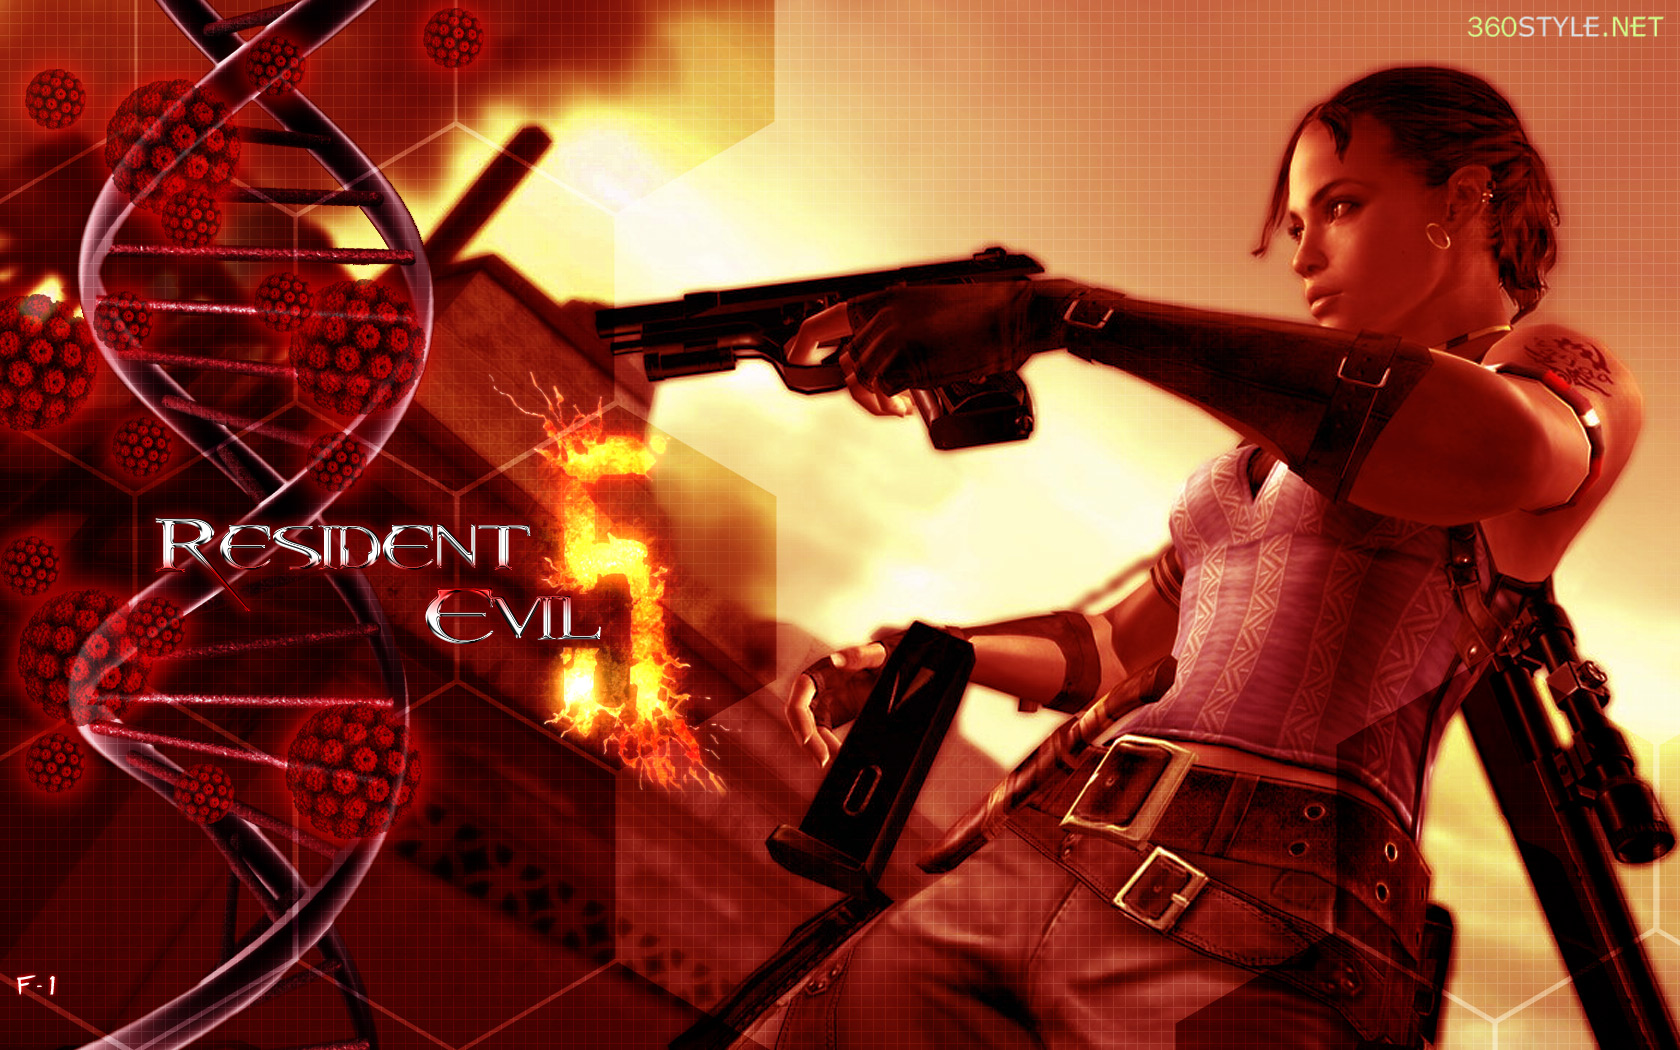 Resident Evil 5 Wallpaper No 3 By F 1 On Deviantart